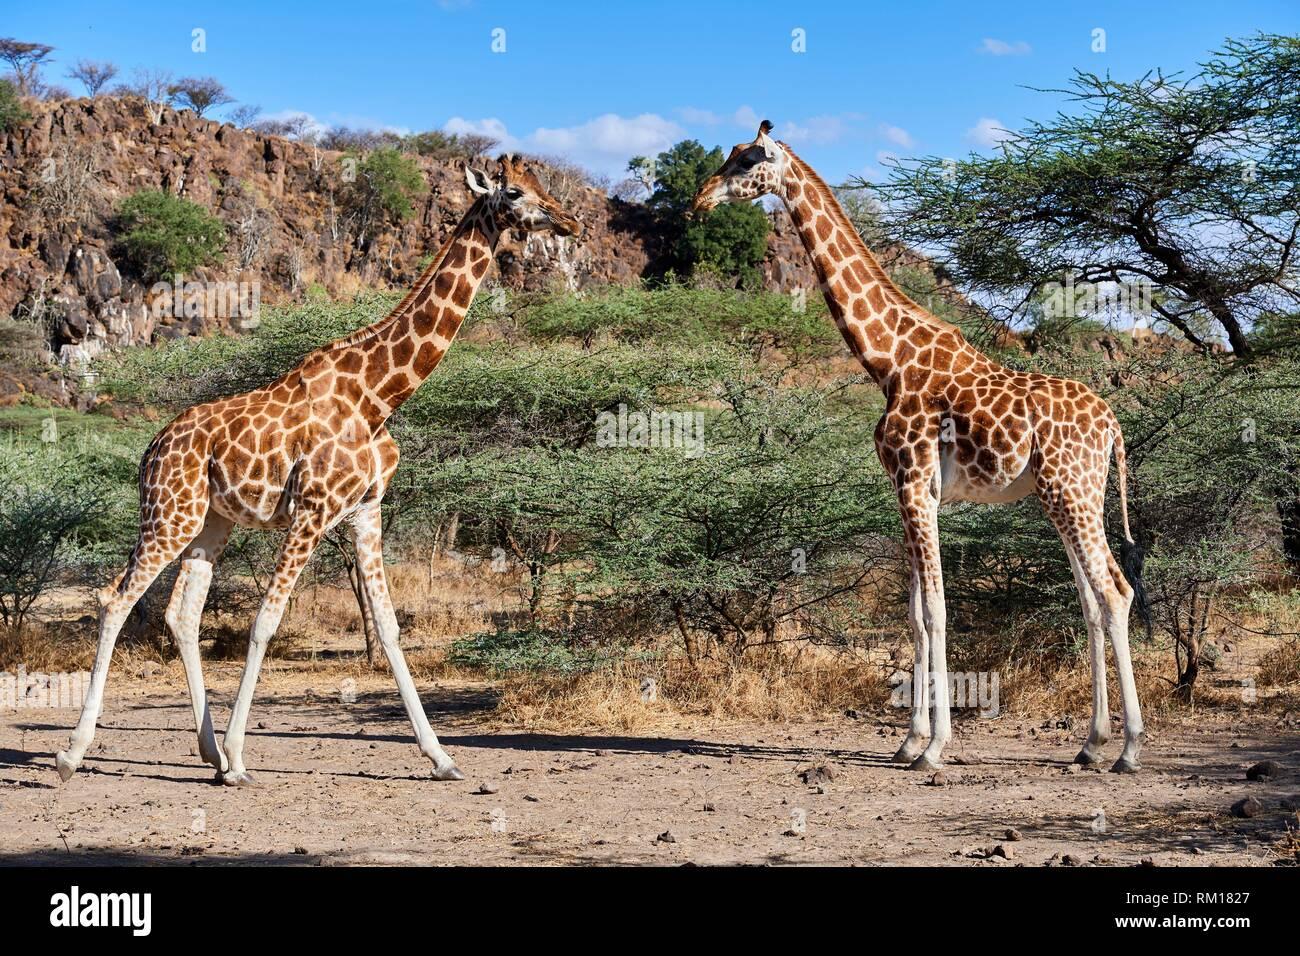 Rothschild giraffe (Giraffa camelopardalis rothschildi) group, Ruko Conservancy island, Lake Baringo, Kenya, Africa. - Stock Image